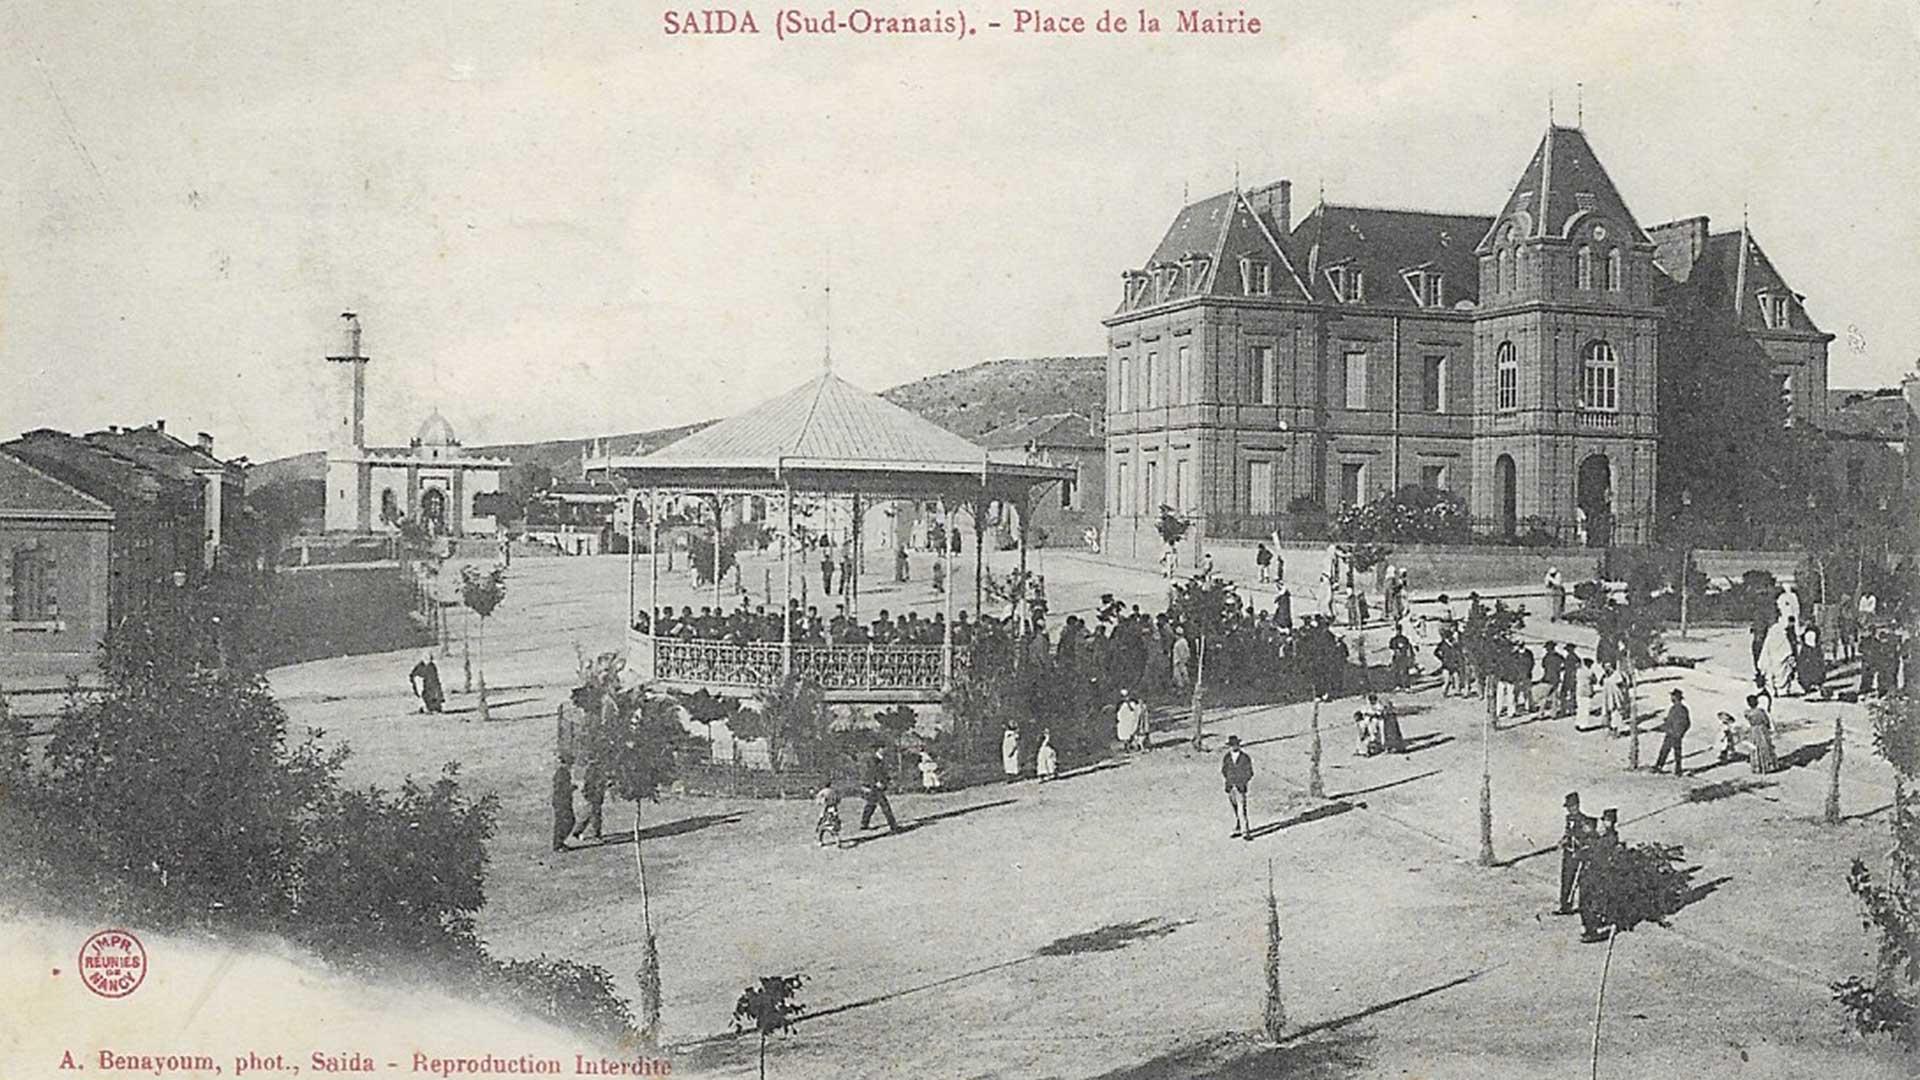 Saïda-Mairie